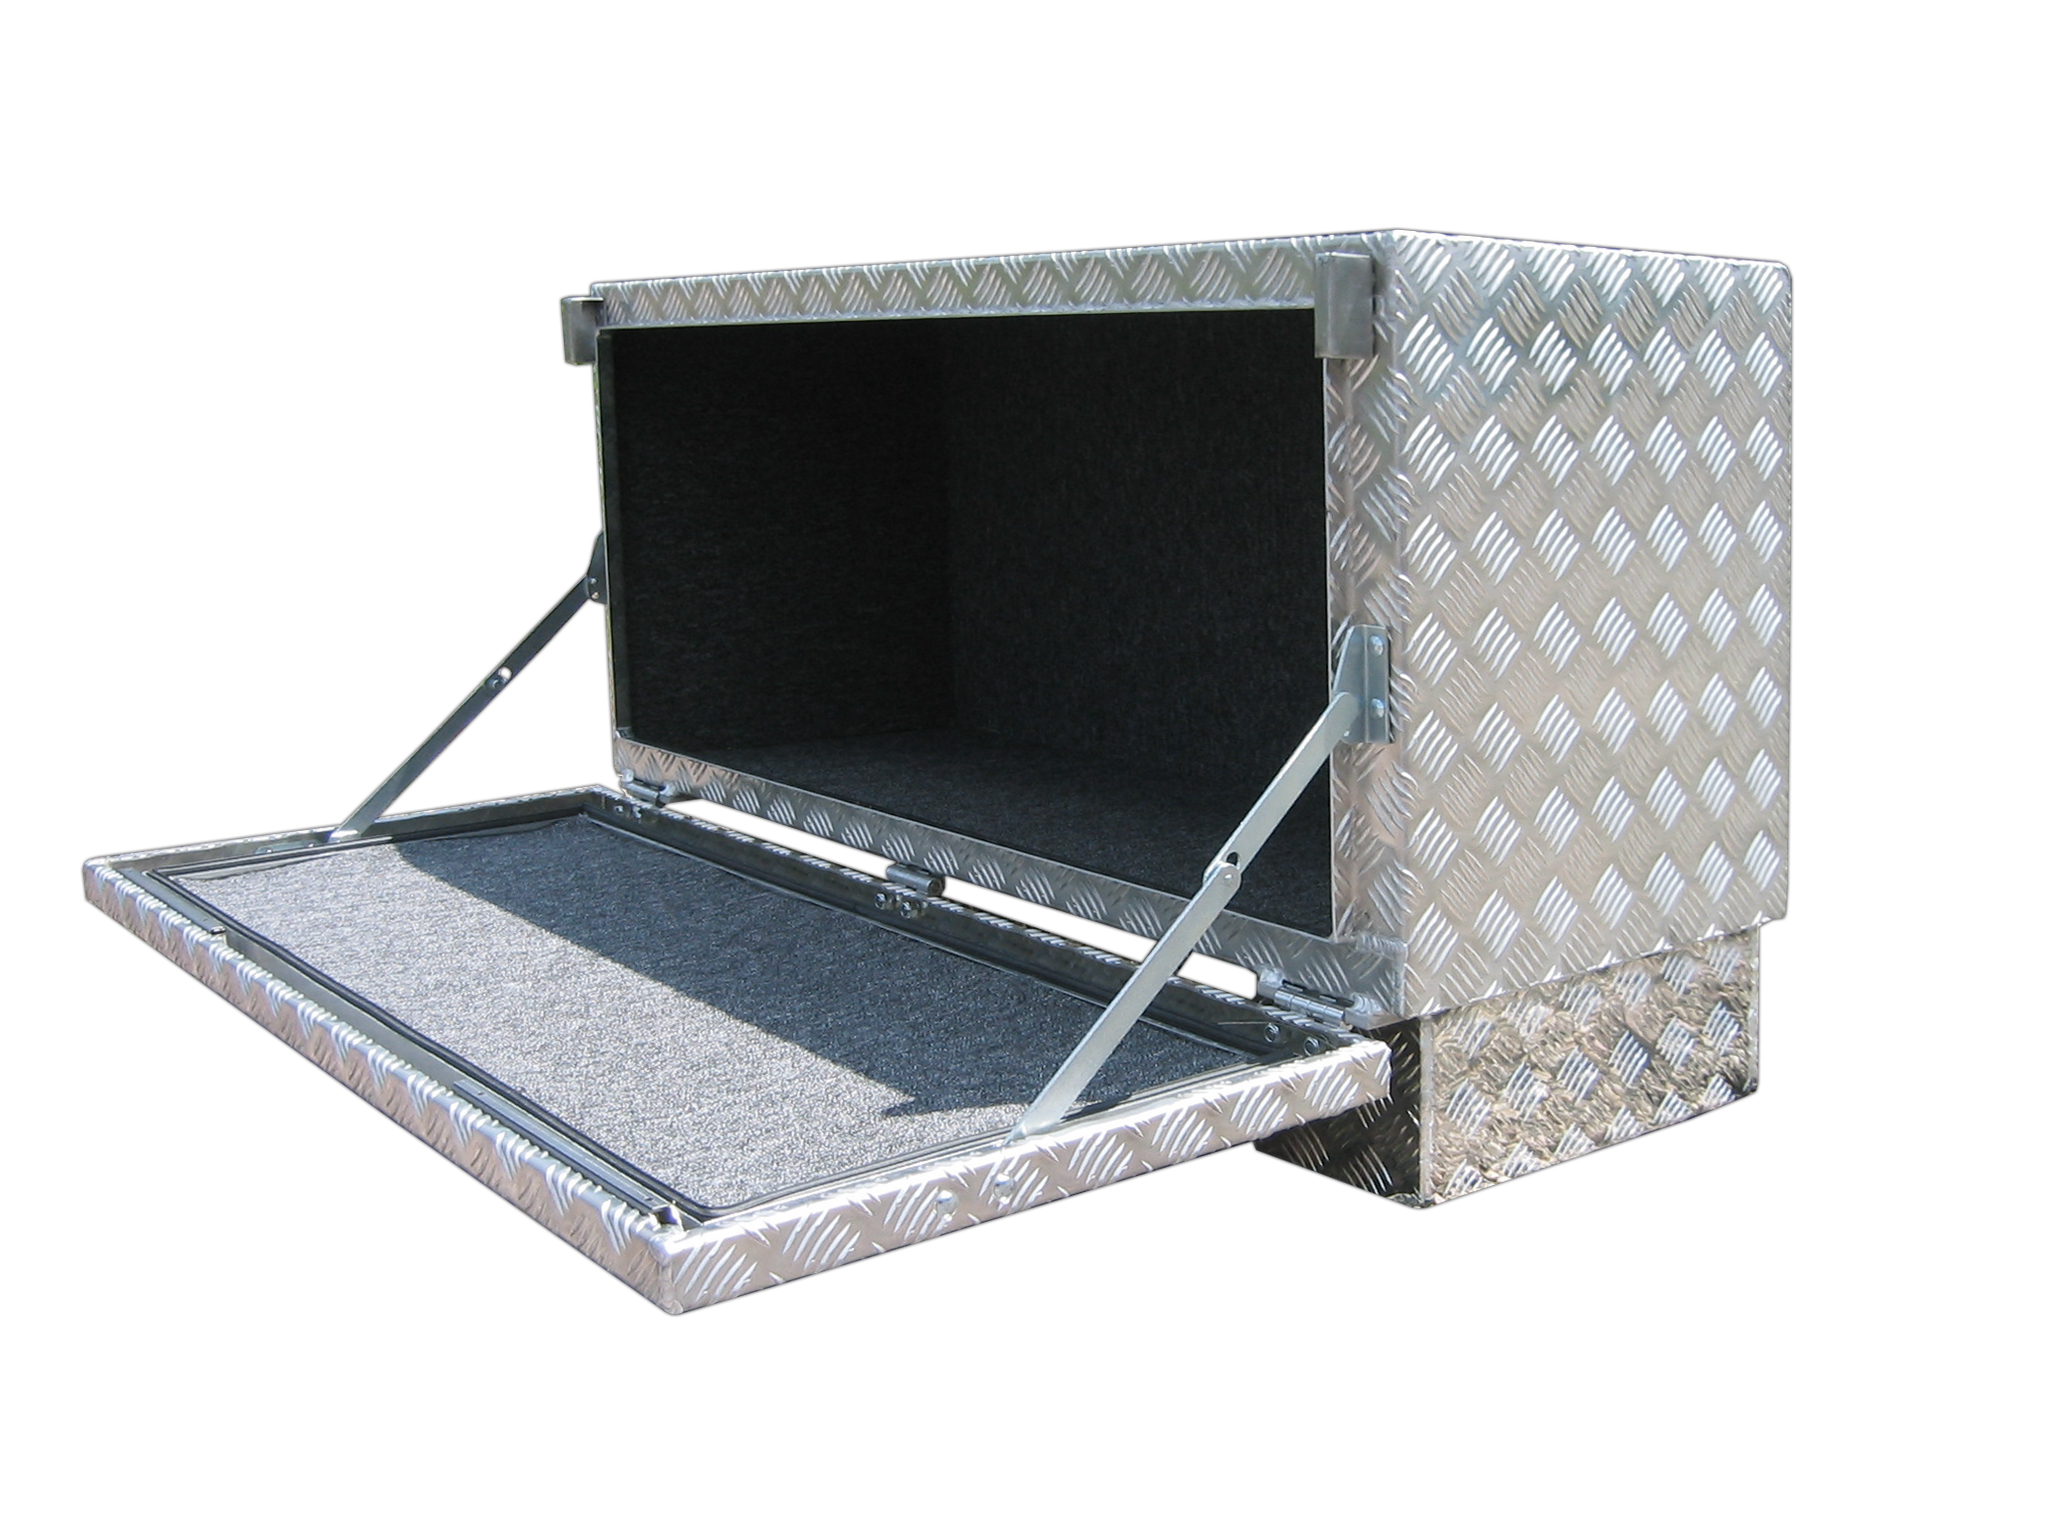 alubox unterflur staukoffer brossbox. Black Bedroom Furniture Sets. Home Design Ideas